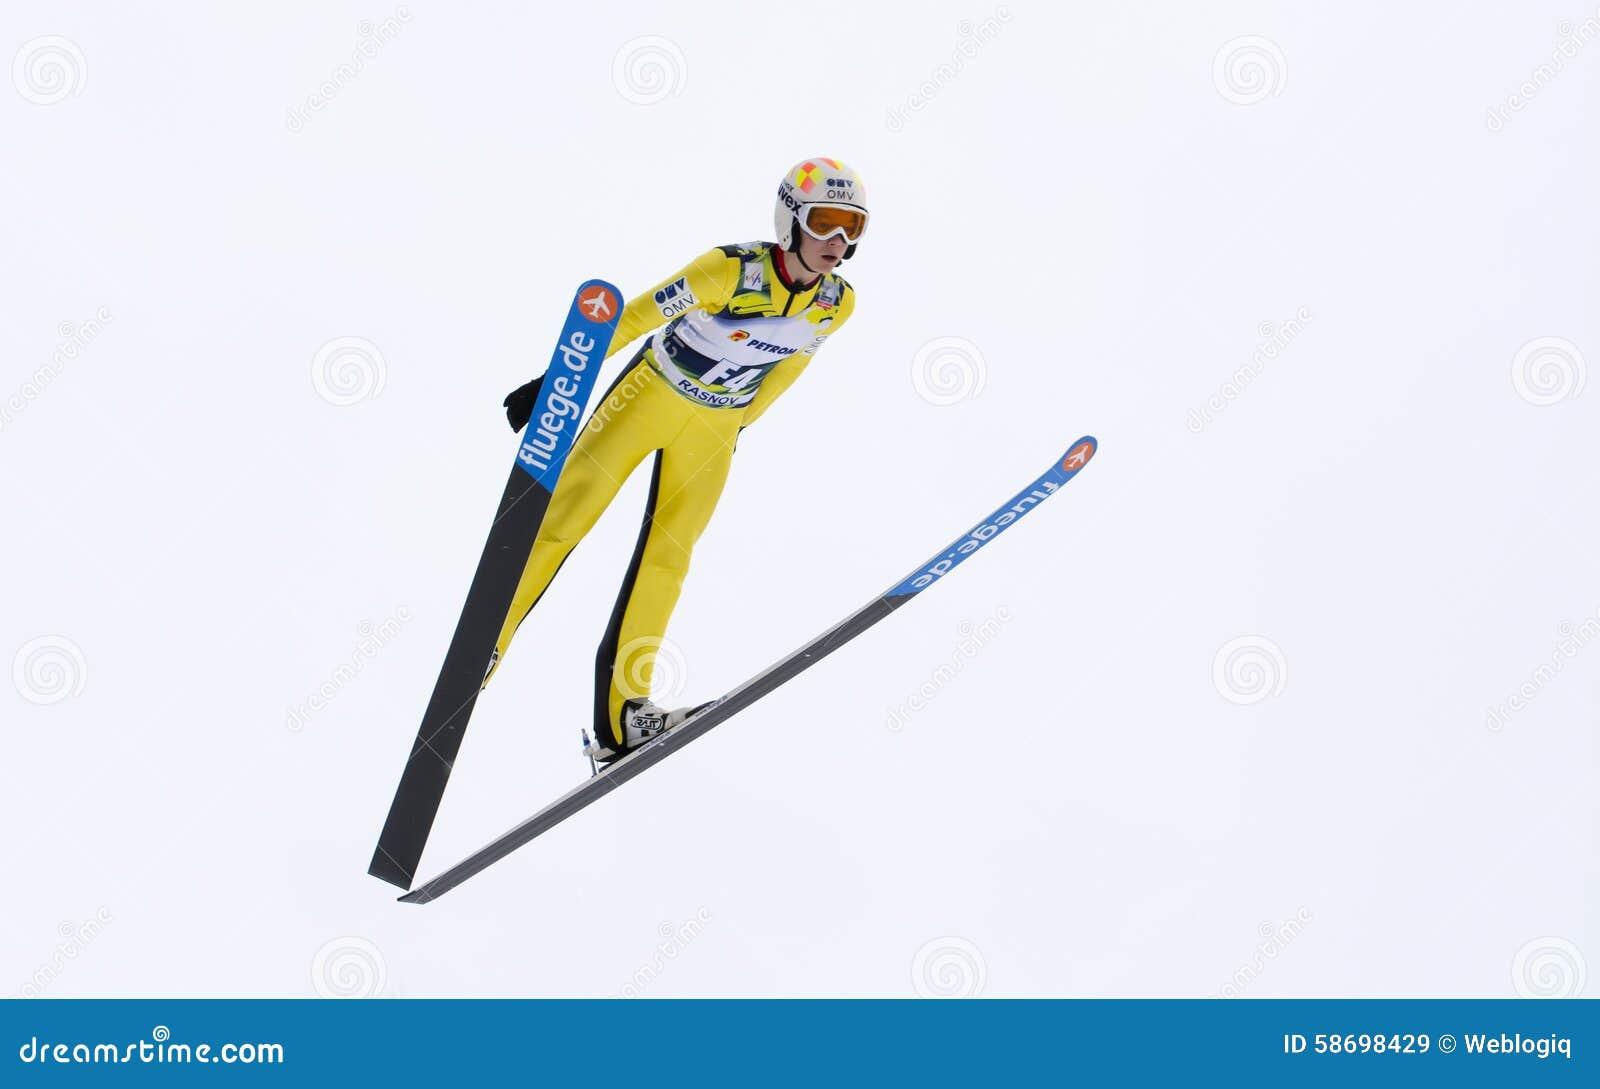 Rasnov, Rumänien - 7. Februar: Unbekannter Skispringer konkurriert im FIS Ski Jumping World Cup Ladys